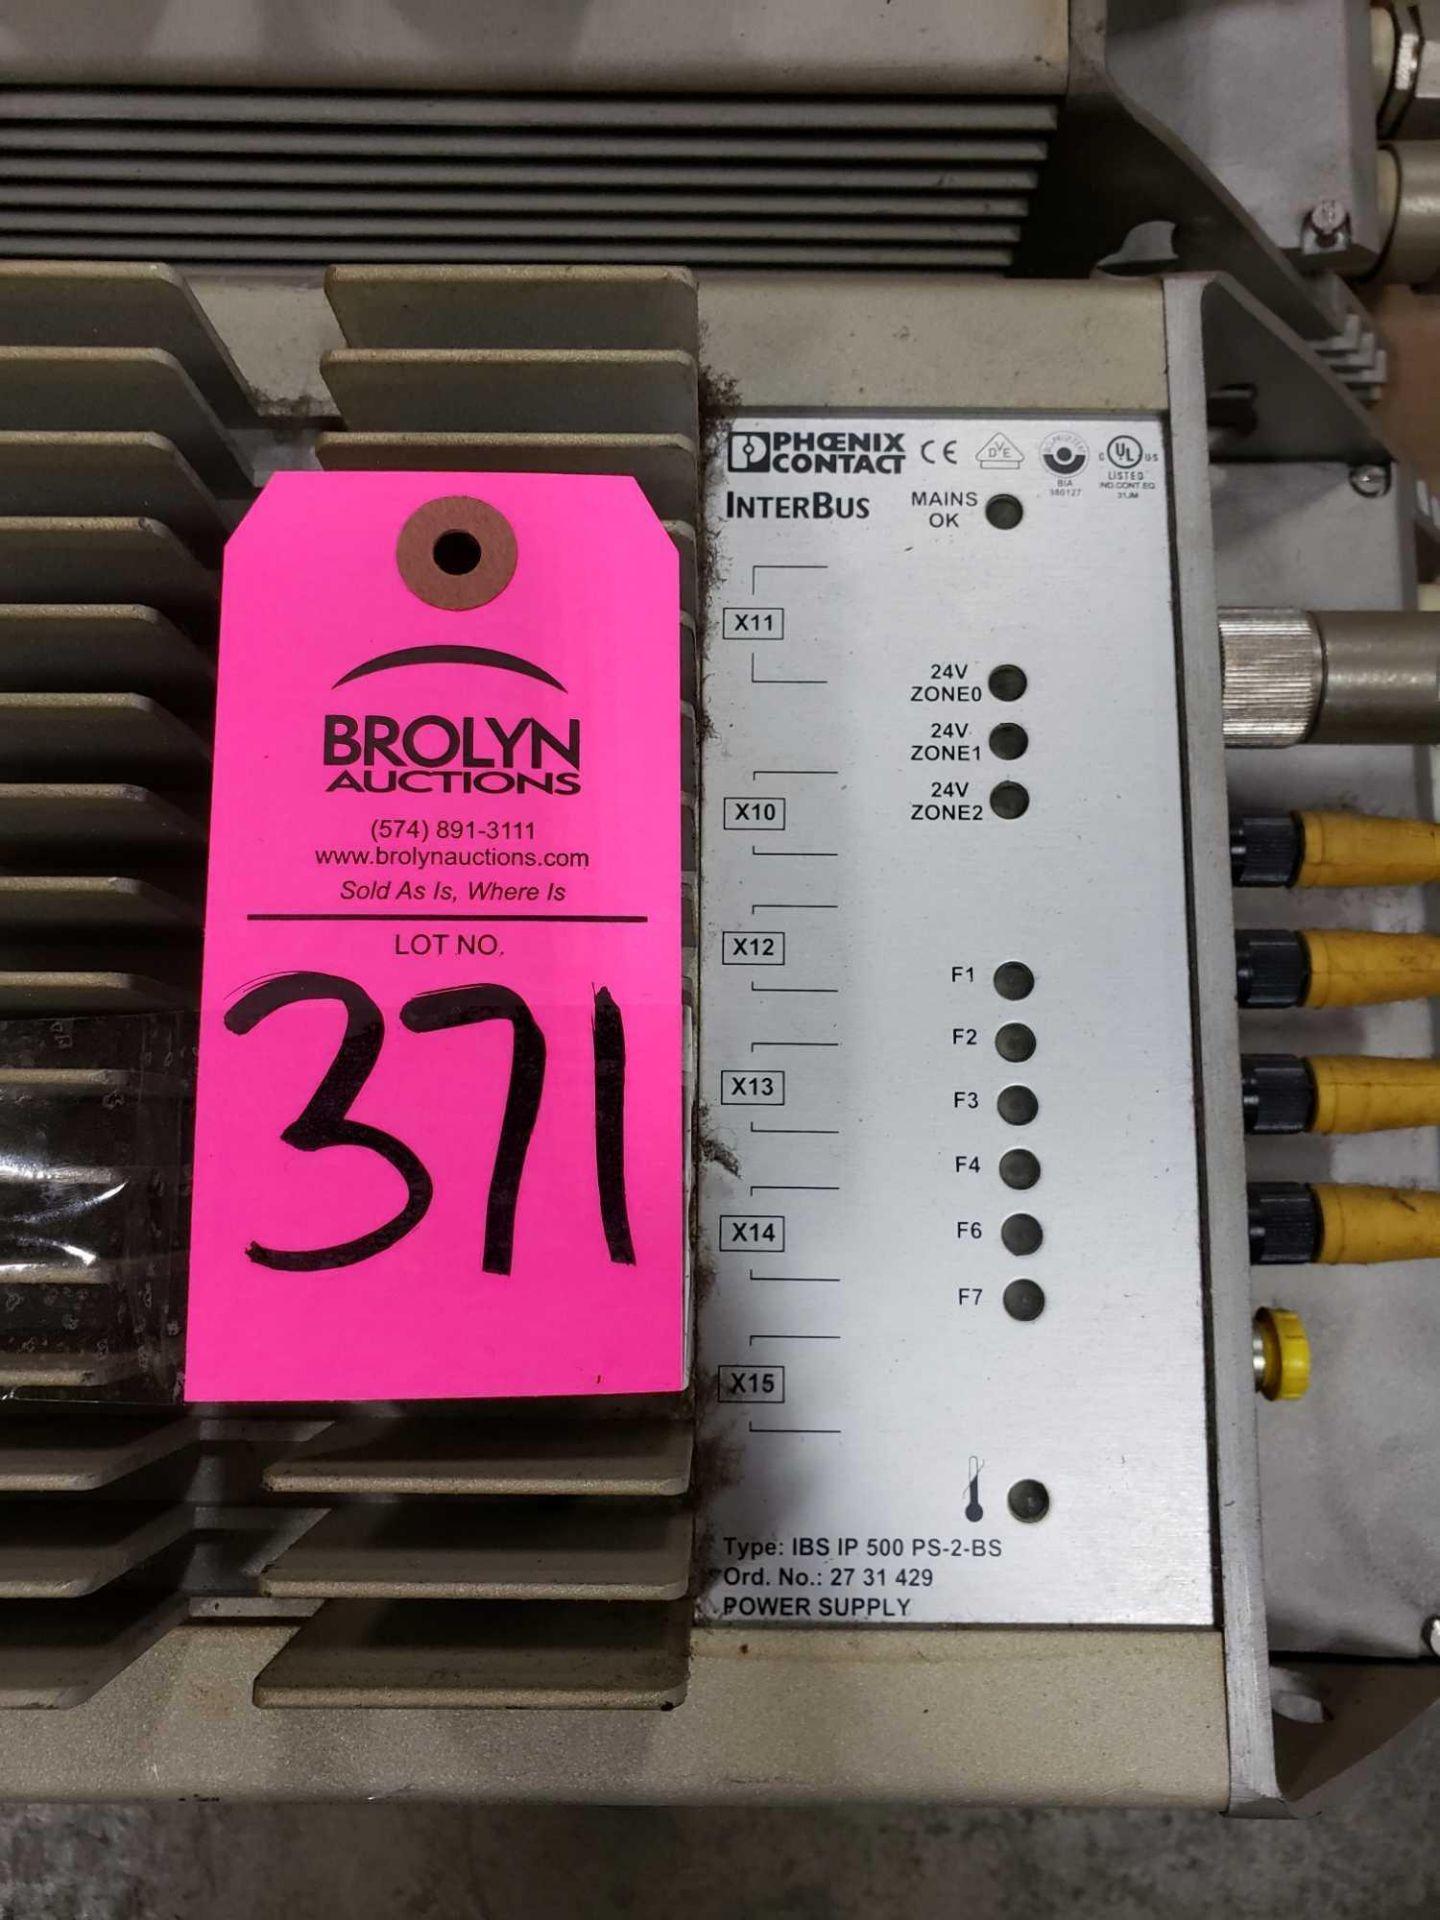 Lot 371 - Phoenix Contact Interbus Type IBS-IP-500-PS-2-BS power supply.